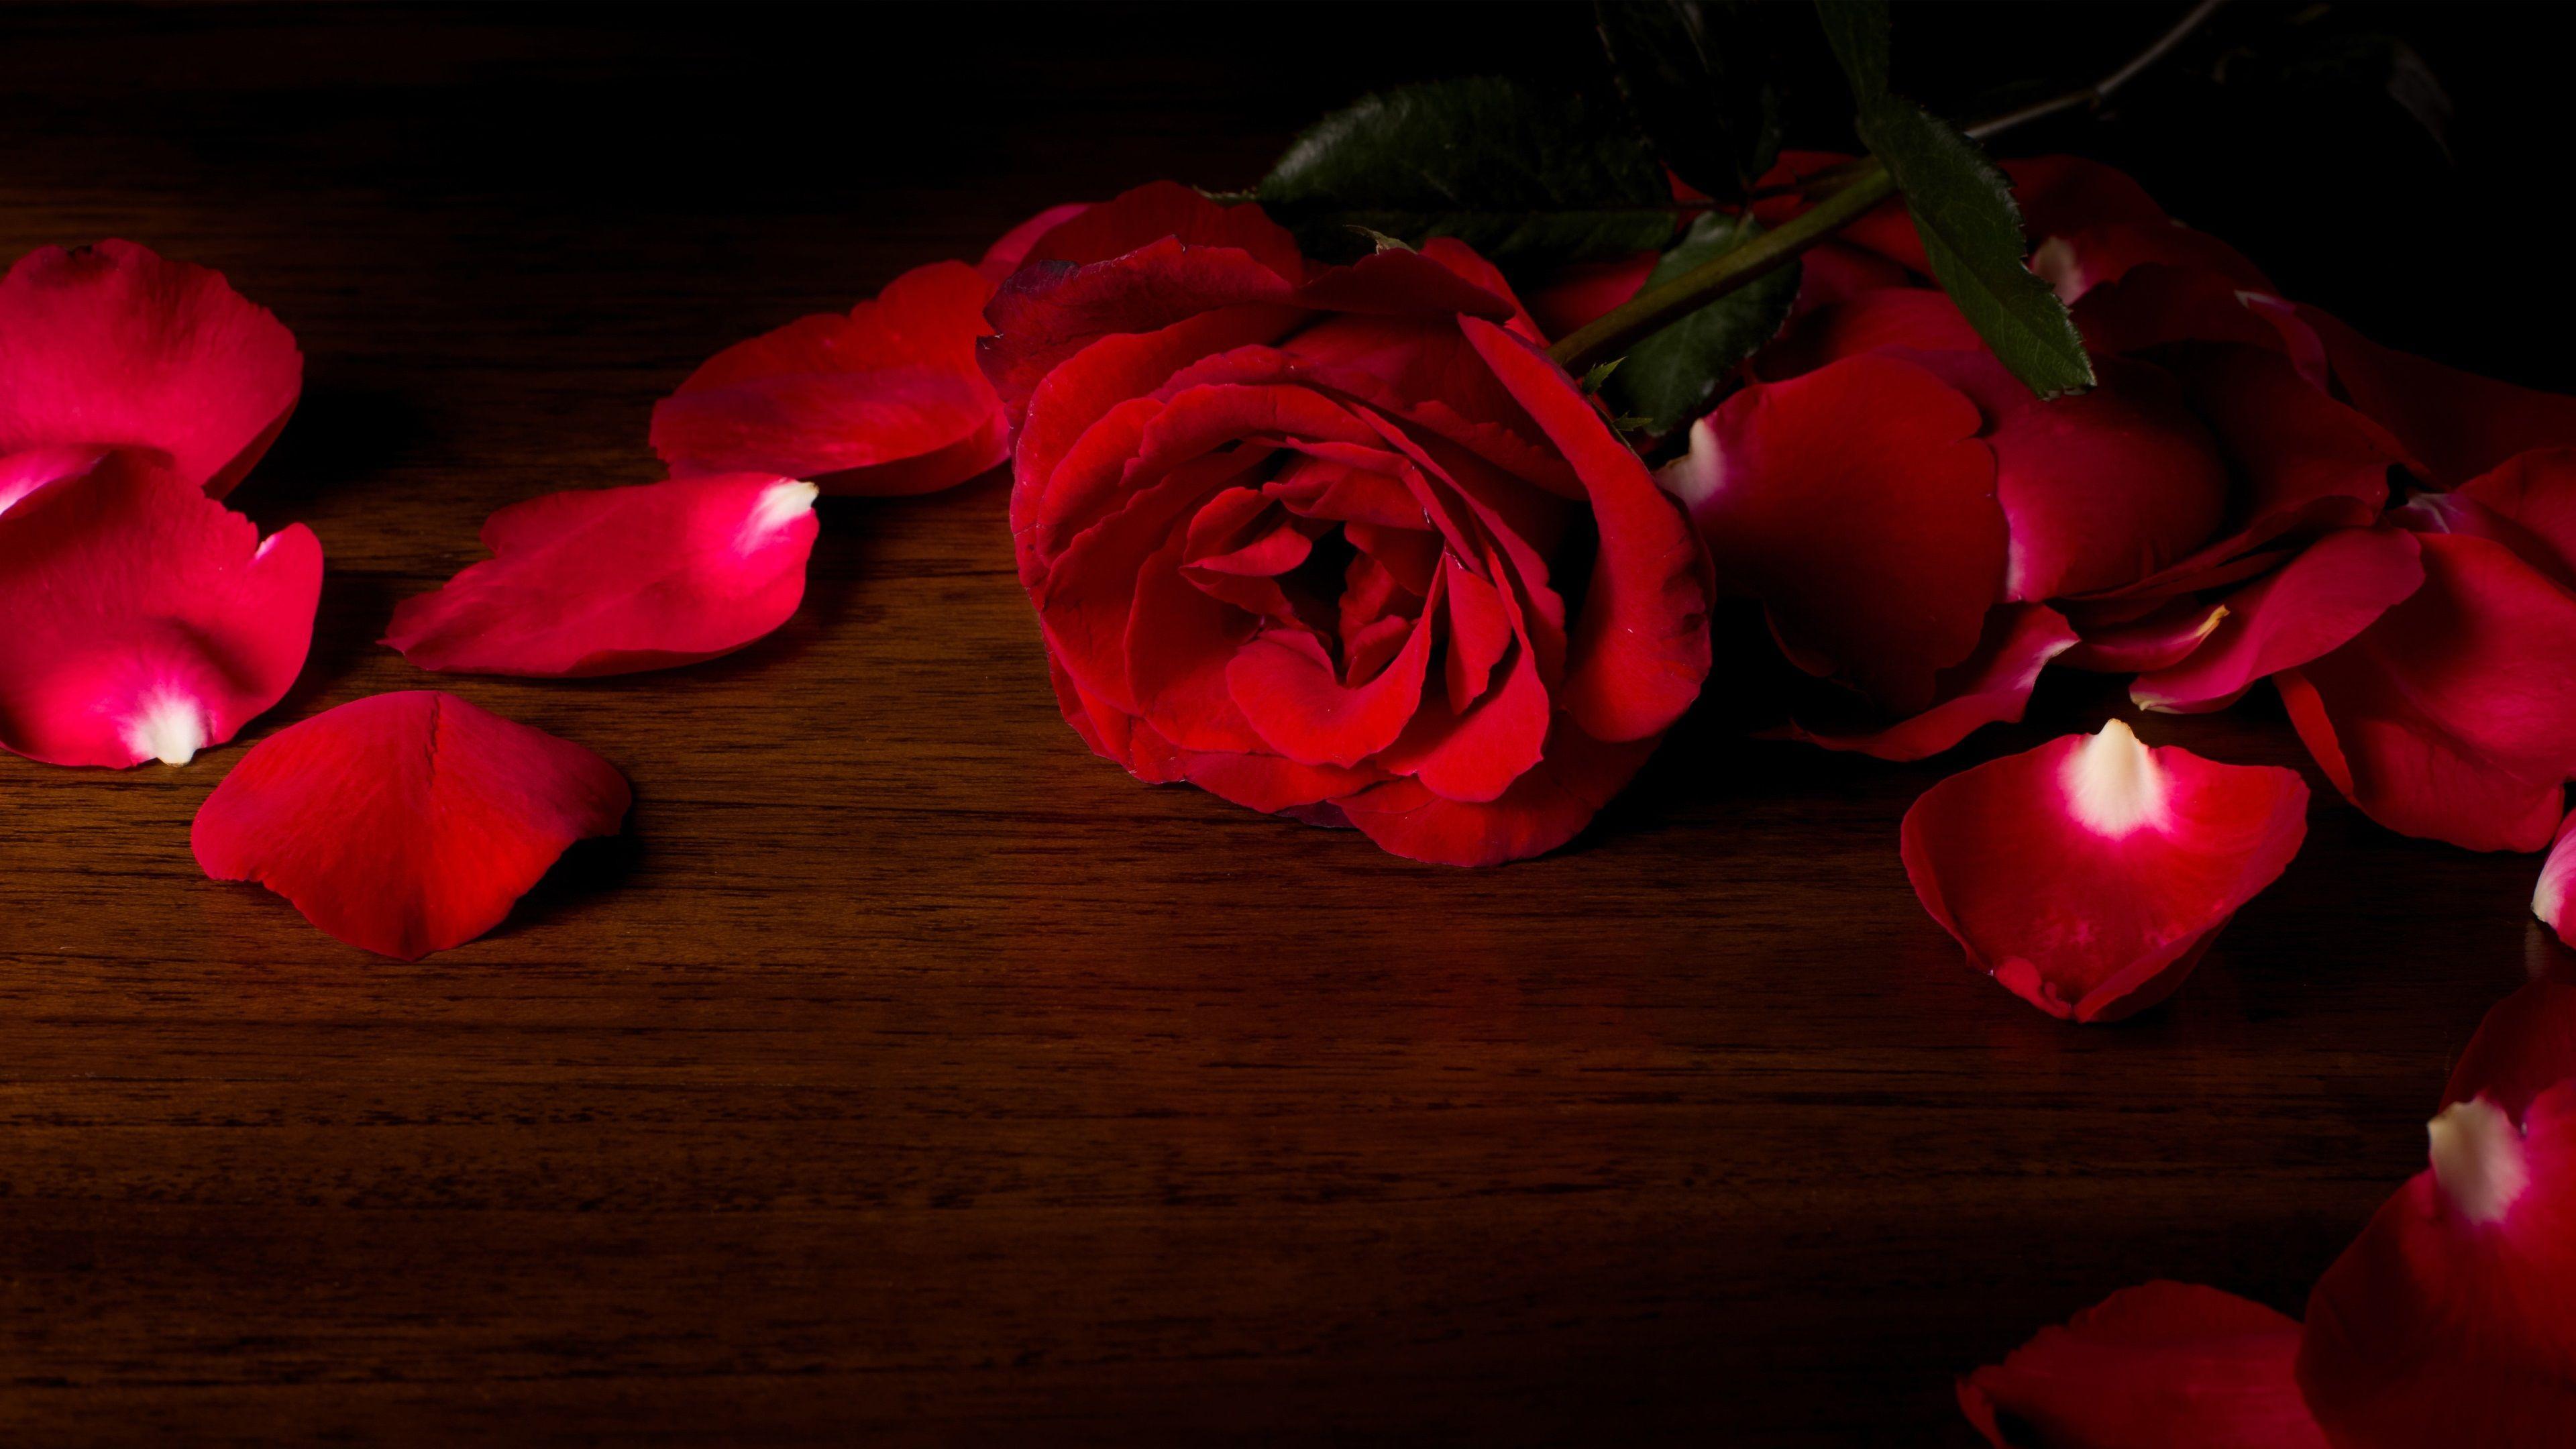 3840x2160 Red Roses 4k Image Background Red Roses Wallpaper Rose Wallpaper Red Roses